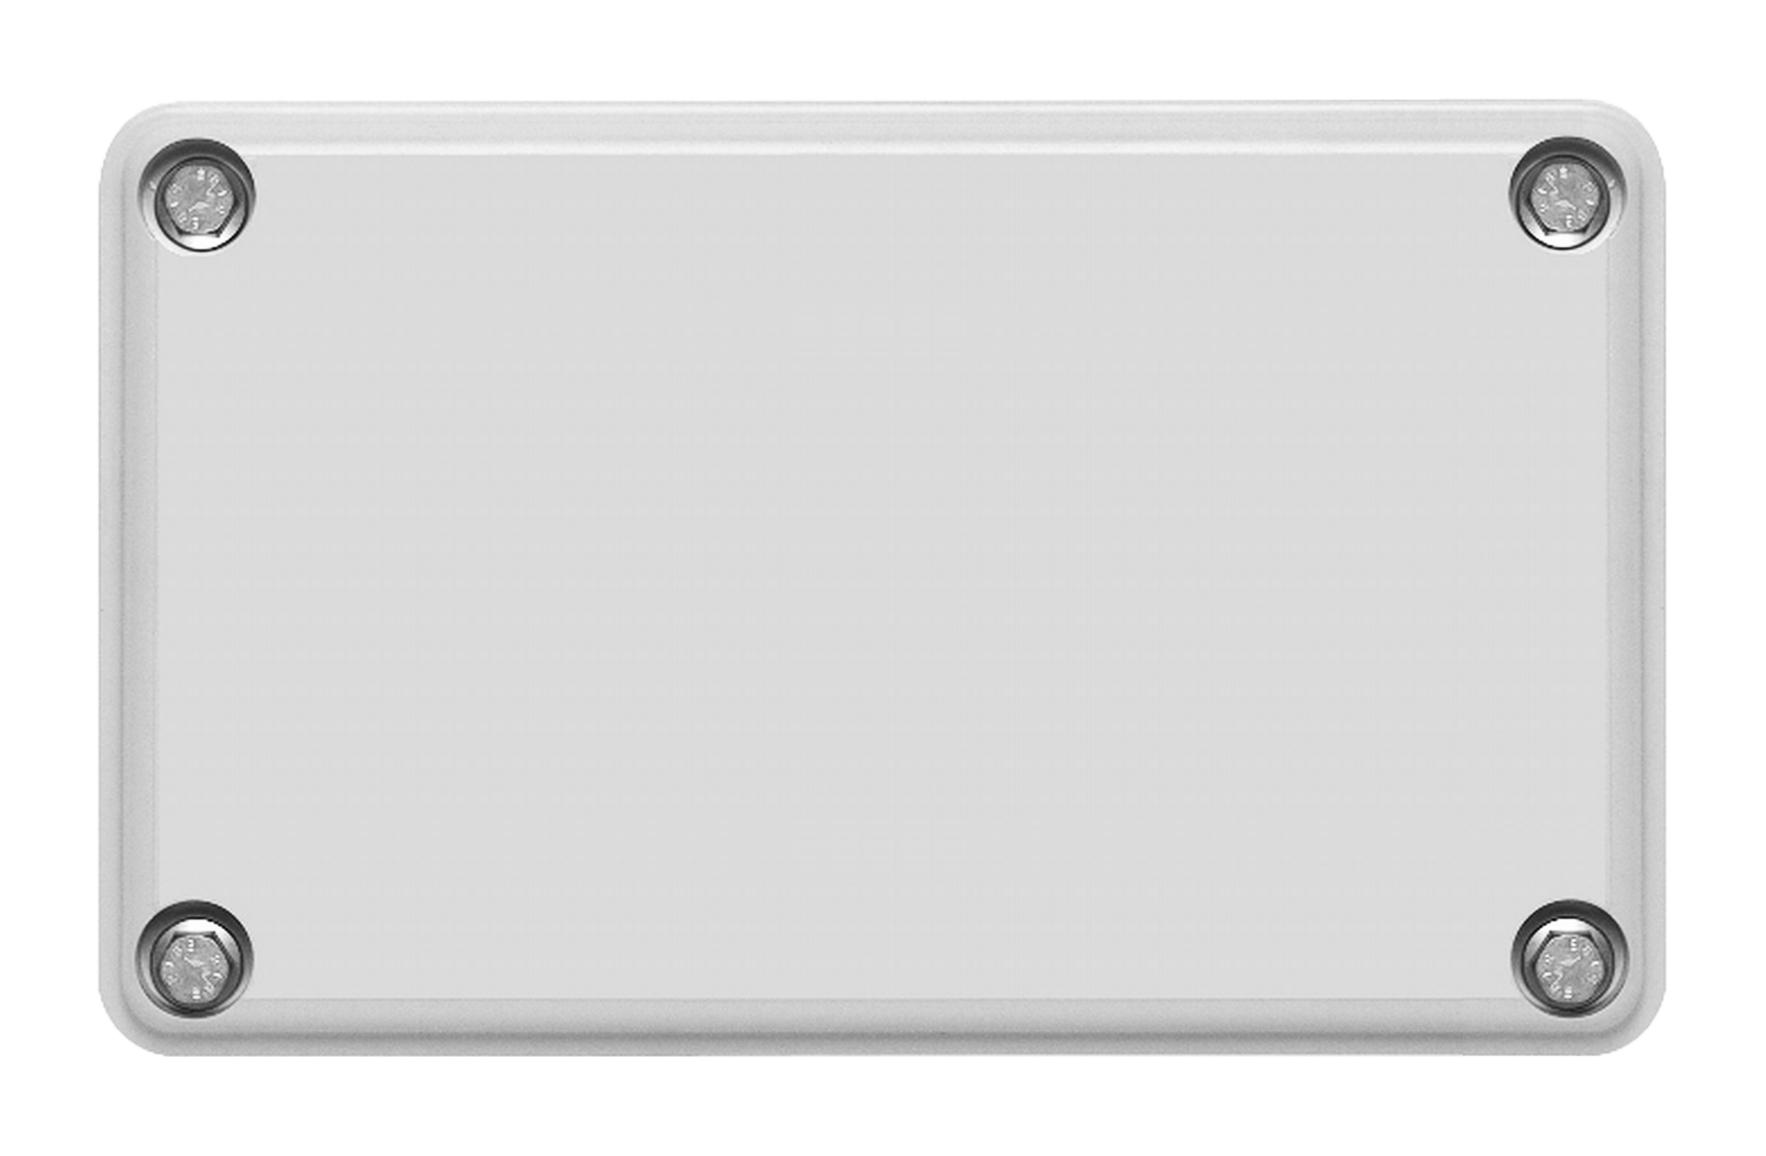 1 Stk Isolierstoff-Flansch blind IL958001--